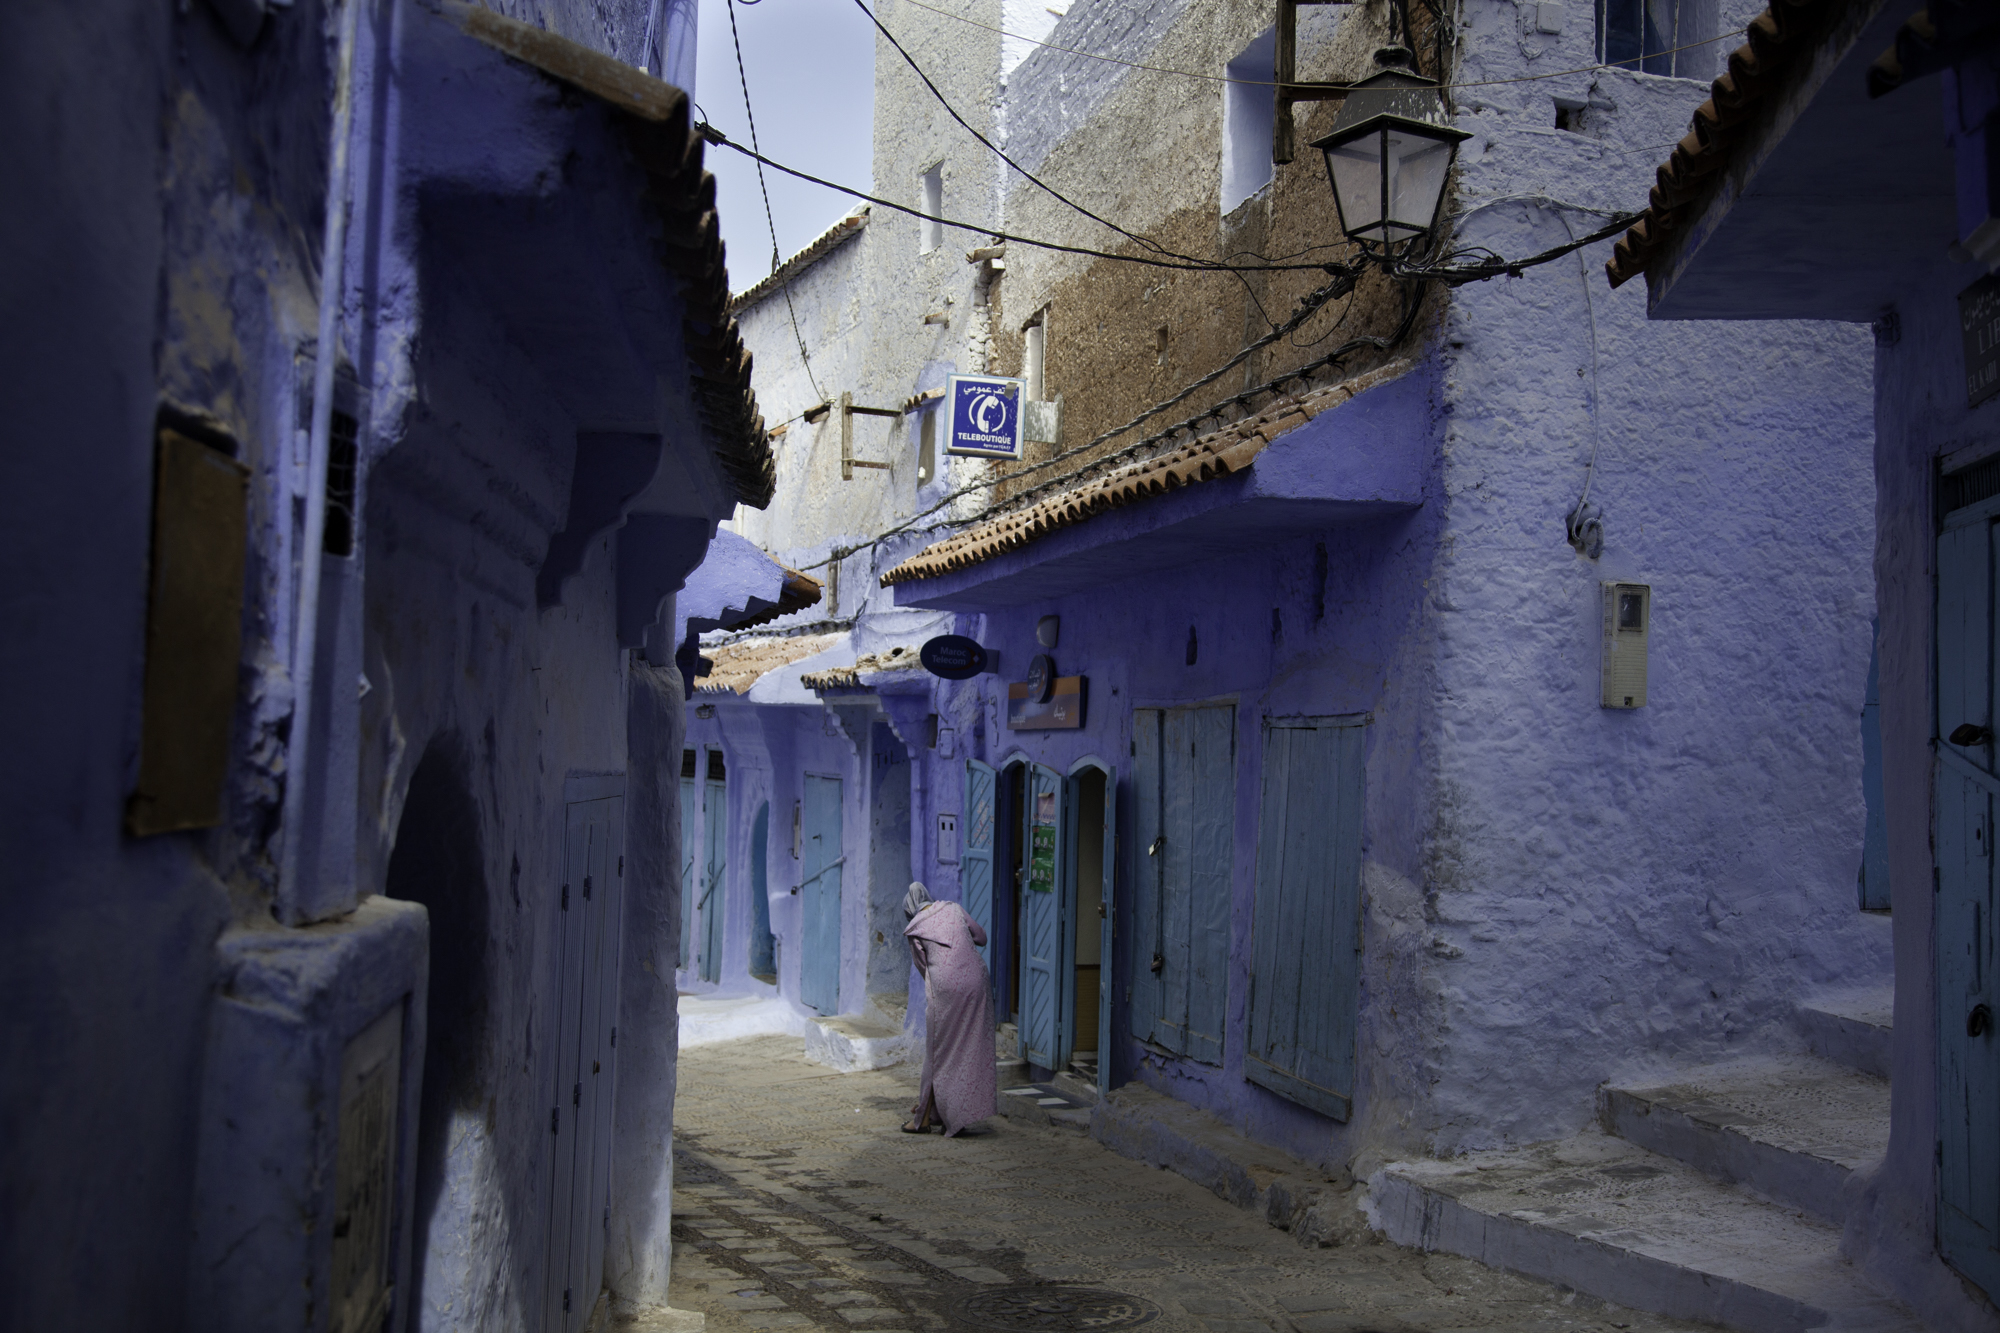 Morocco-2-25.jpg